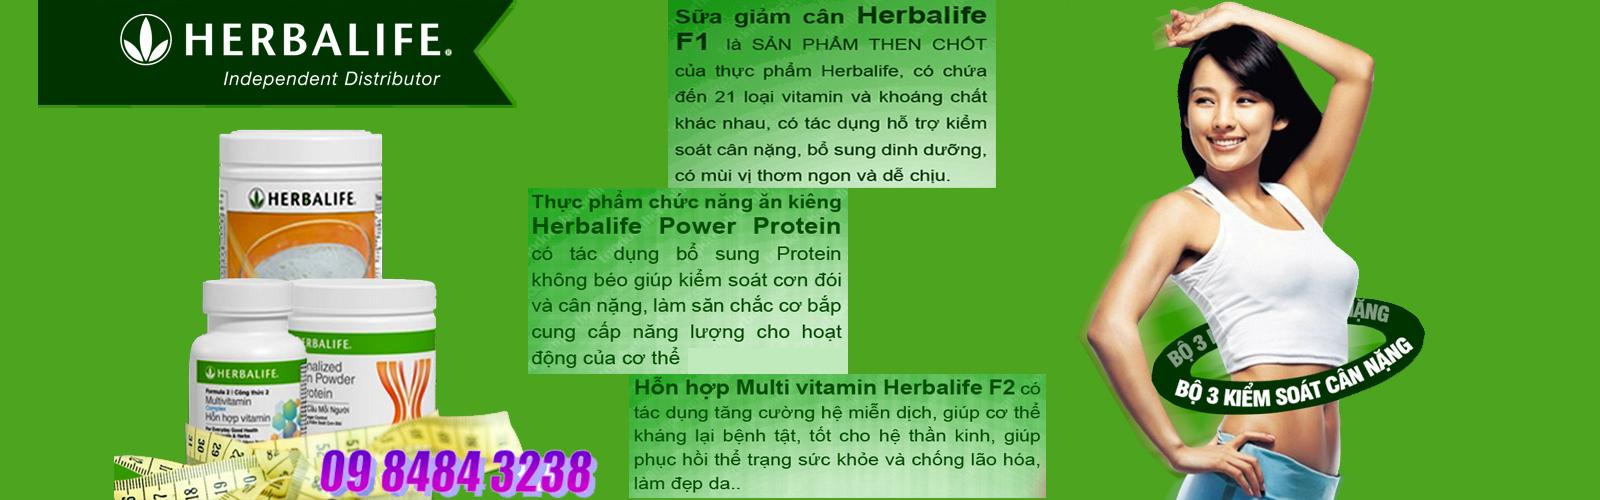 banner-herbalife-1111